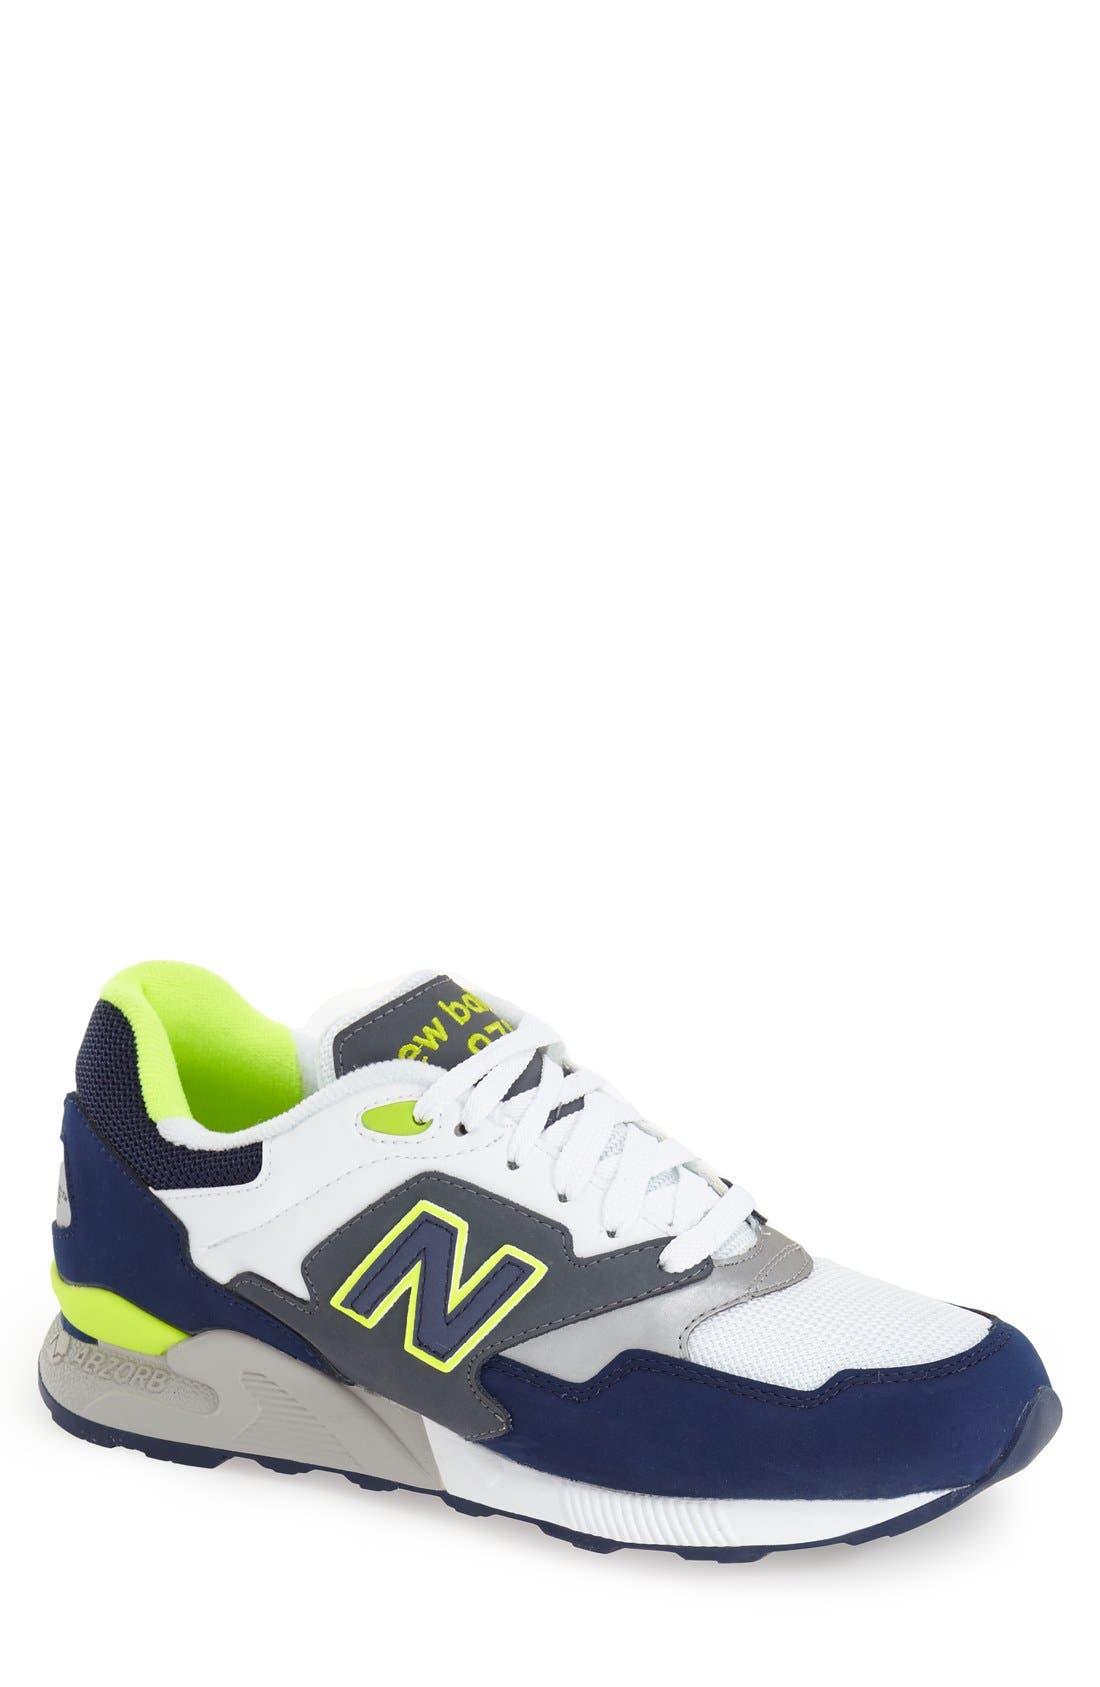 '878' Sneaker,                             Main thumbnail 1, color,                             033